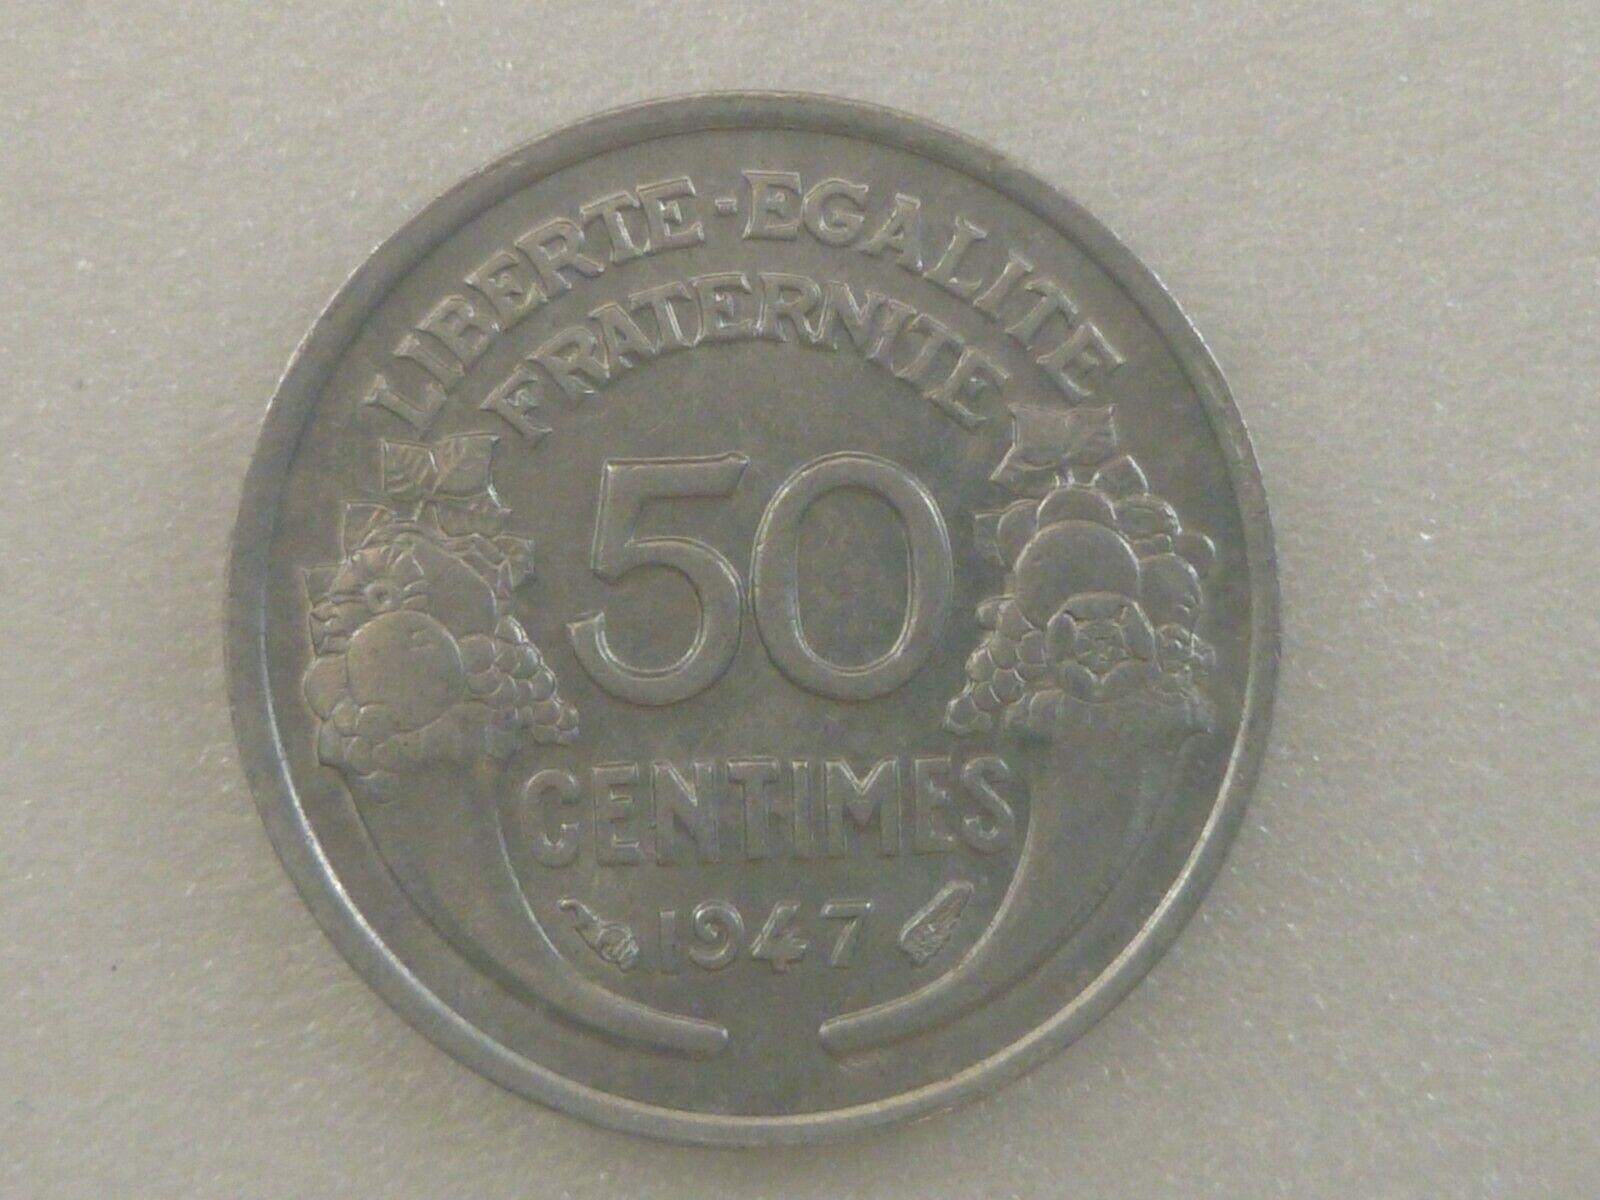 FRANCE 50 centimes -1947- aluminium FDC/UNC